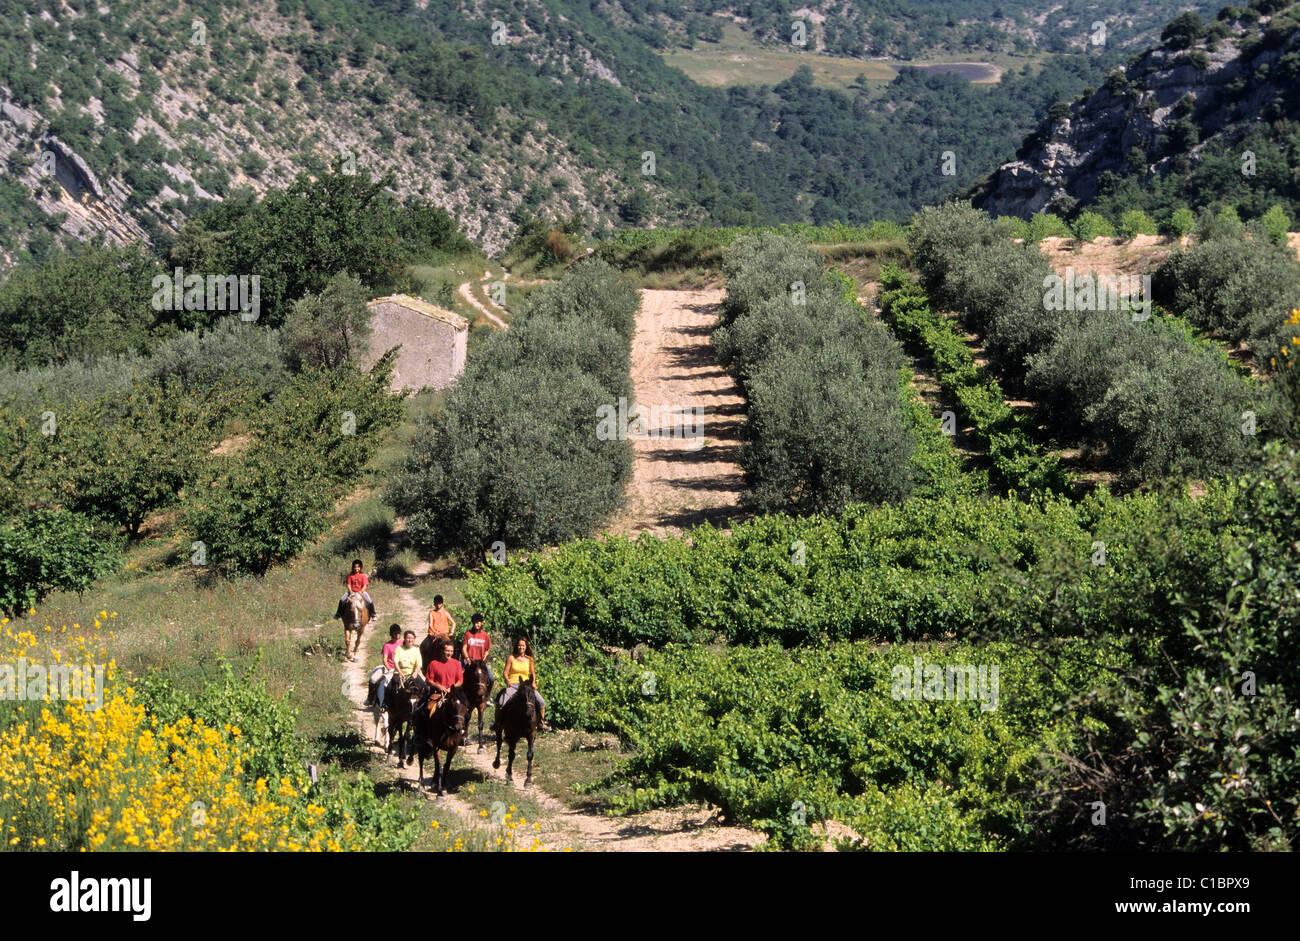 France, Drome, paysage des Baronnies - Stock Image